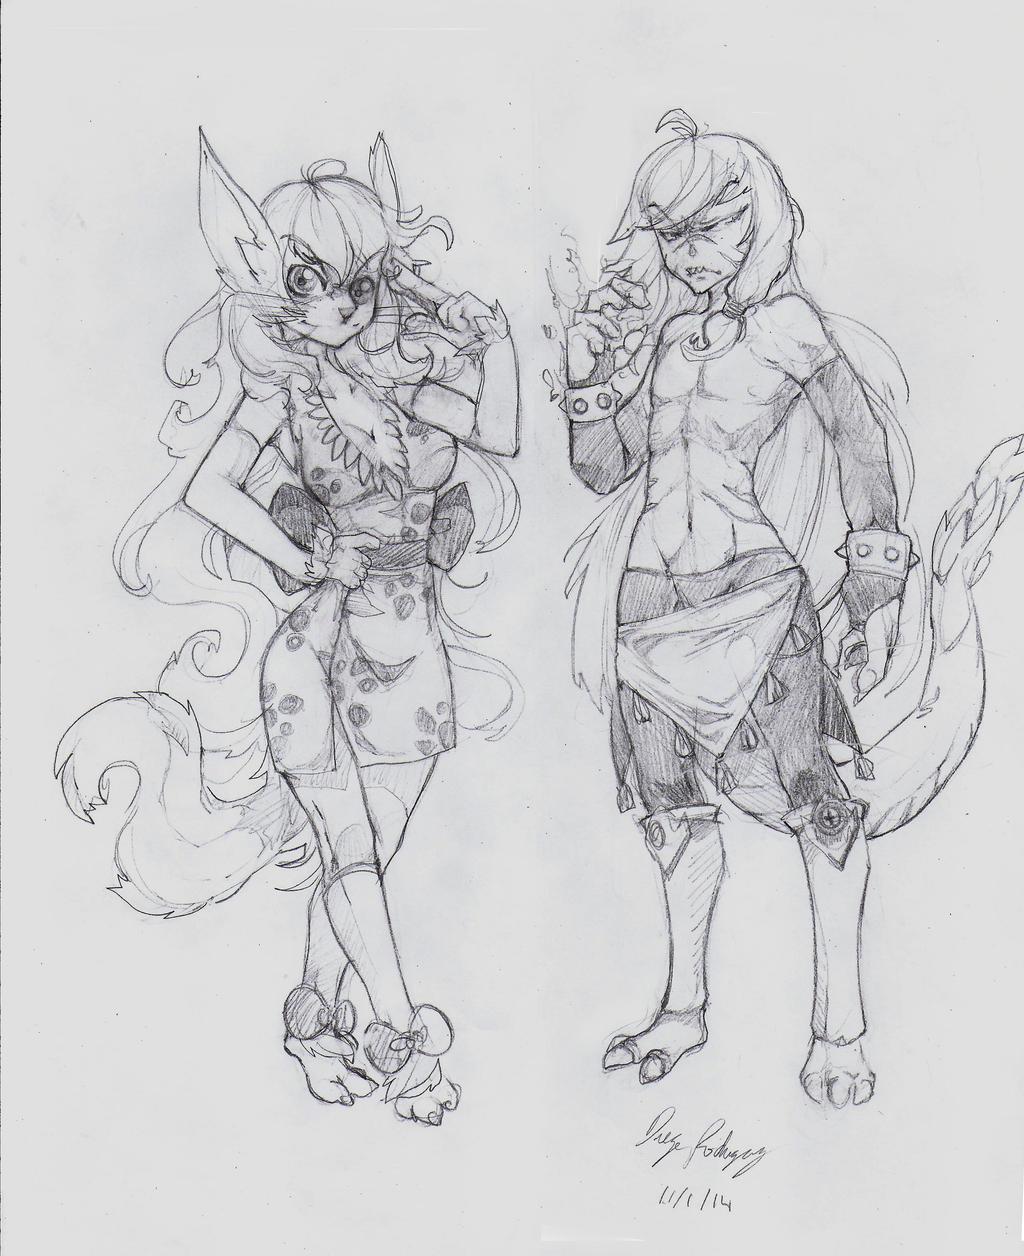 OC - Kats (Left) Drake (Right) by snoop19922002